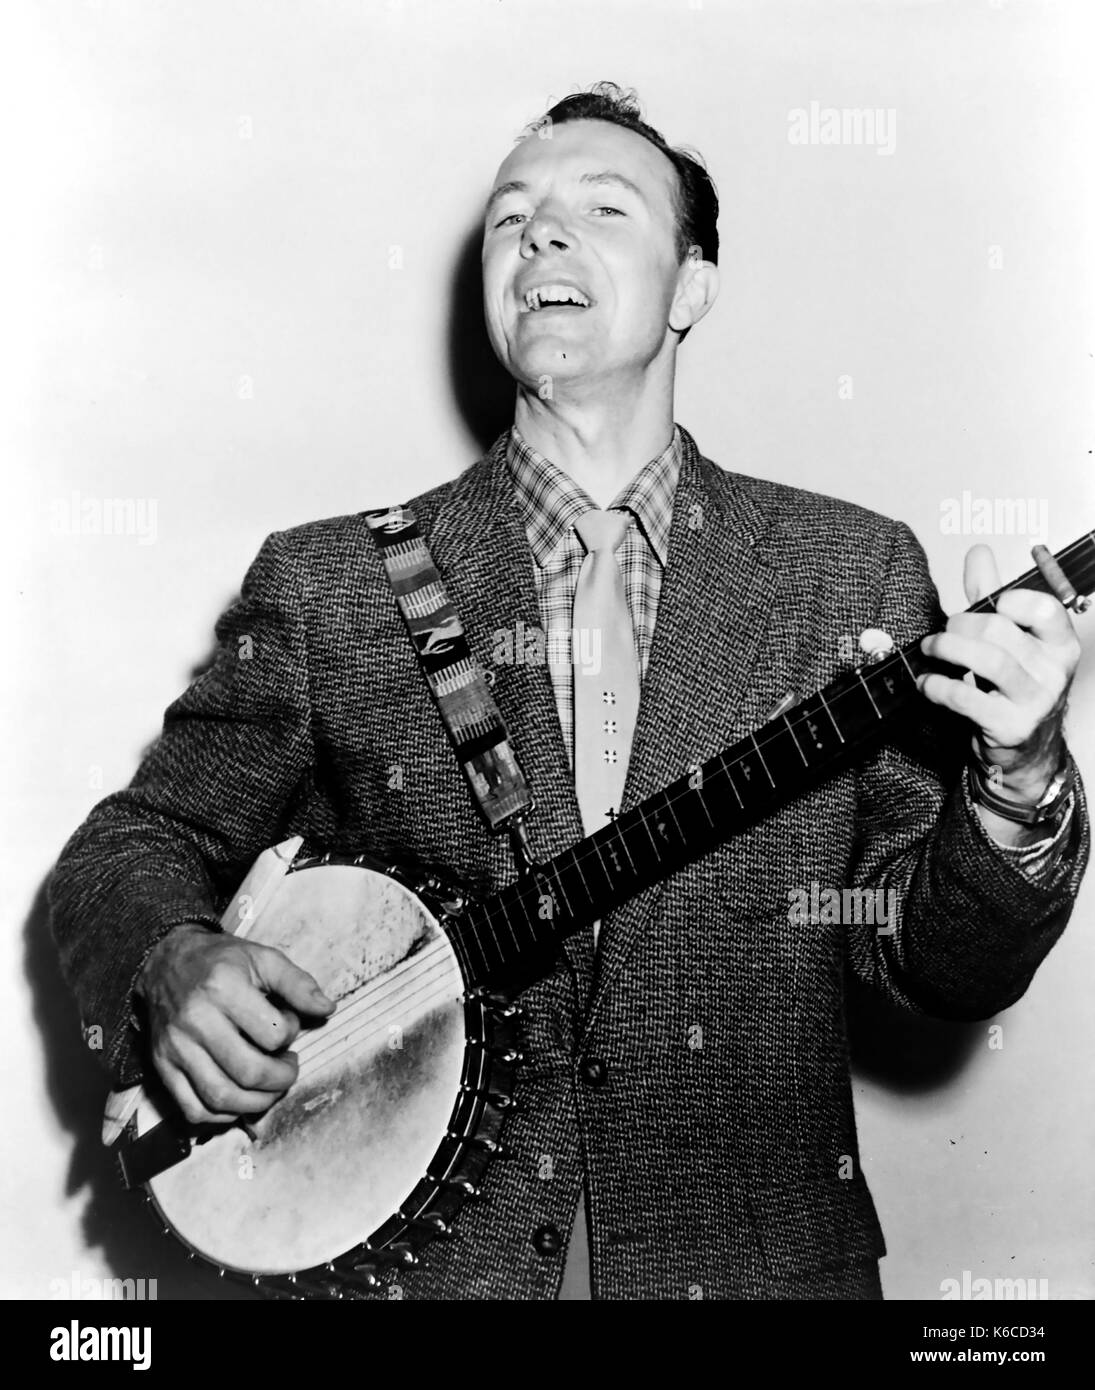 PETE SEEGER (1919-2014) American folk musician in 1955 - Stock Image